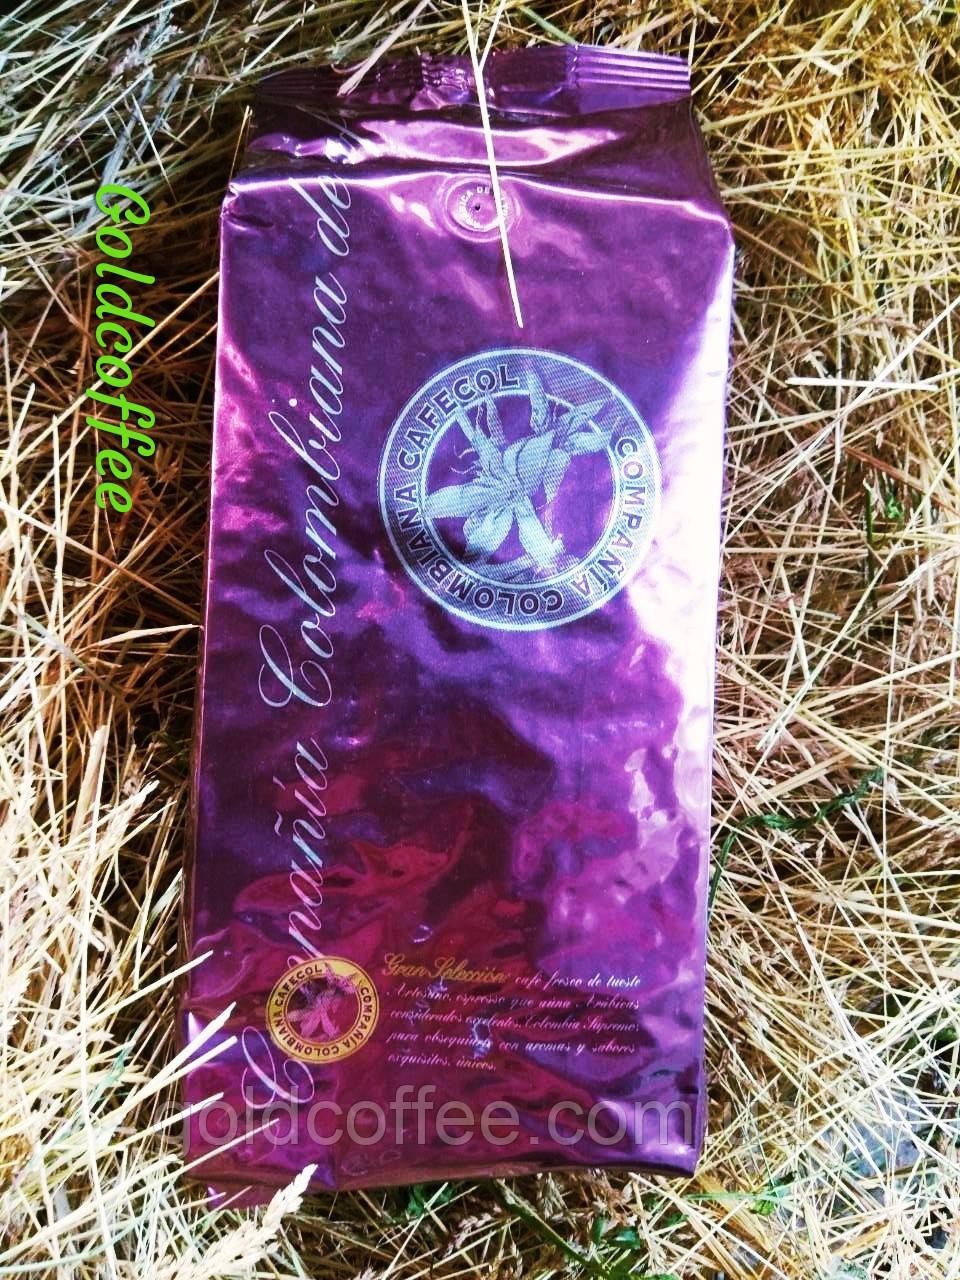 Зерновой кофе Colombiana purple 1кг